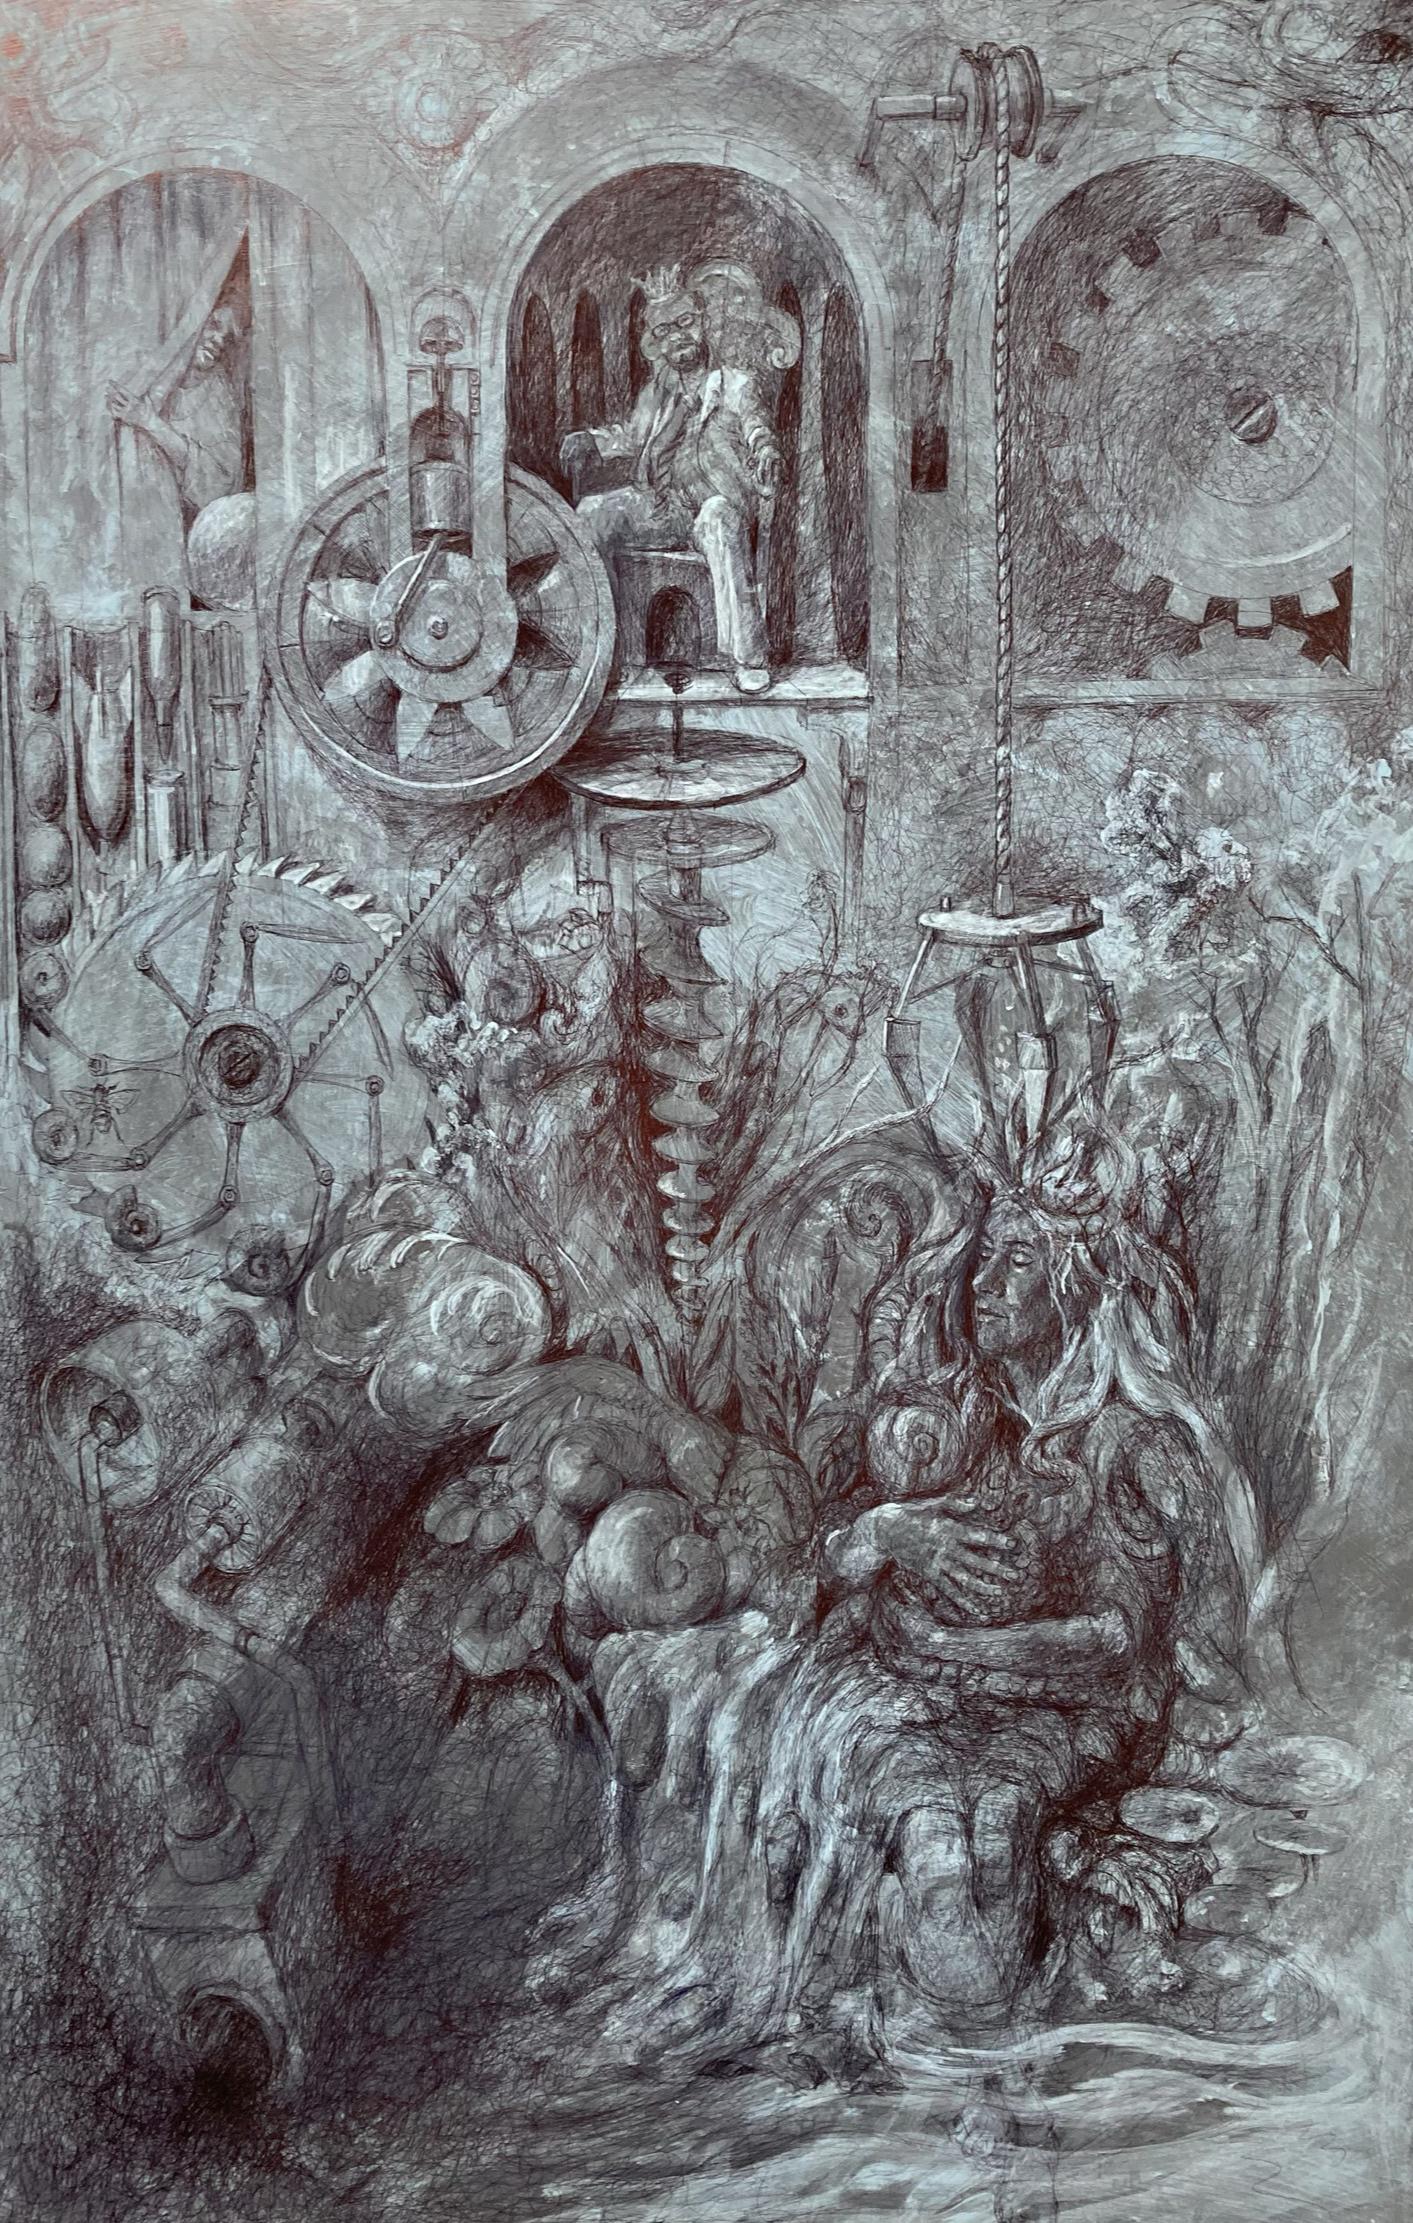 Mother Earth artwork